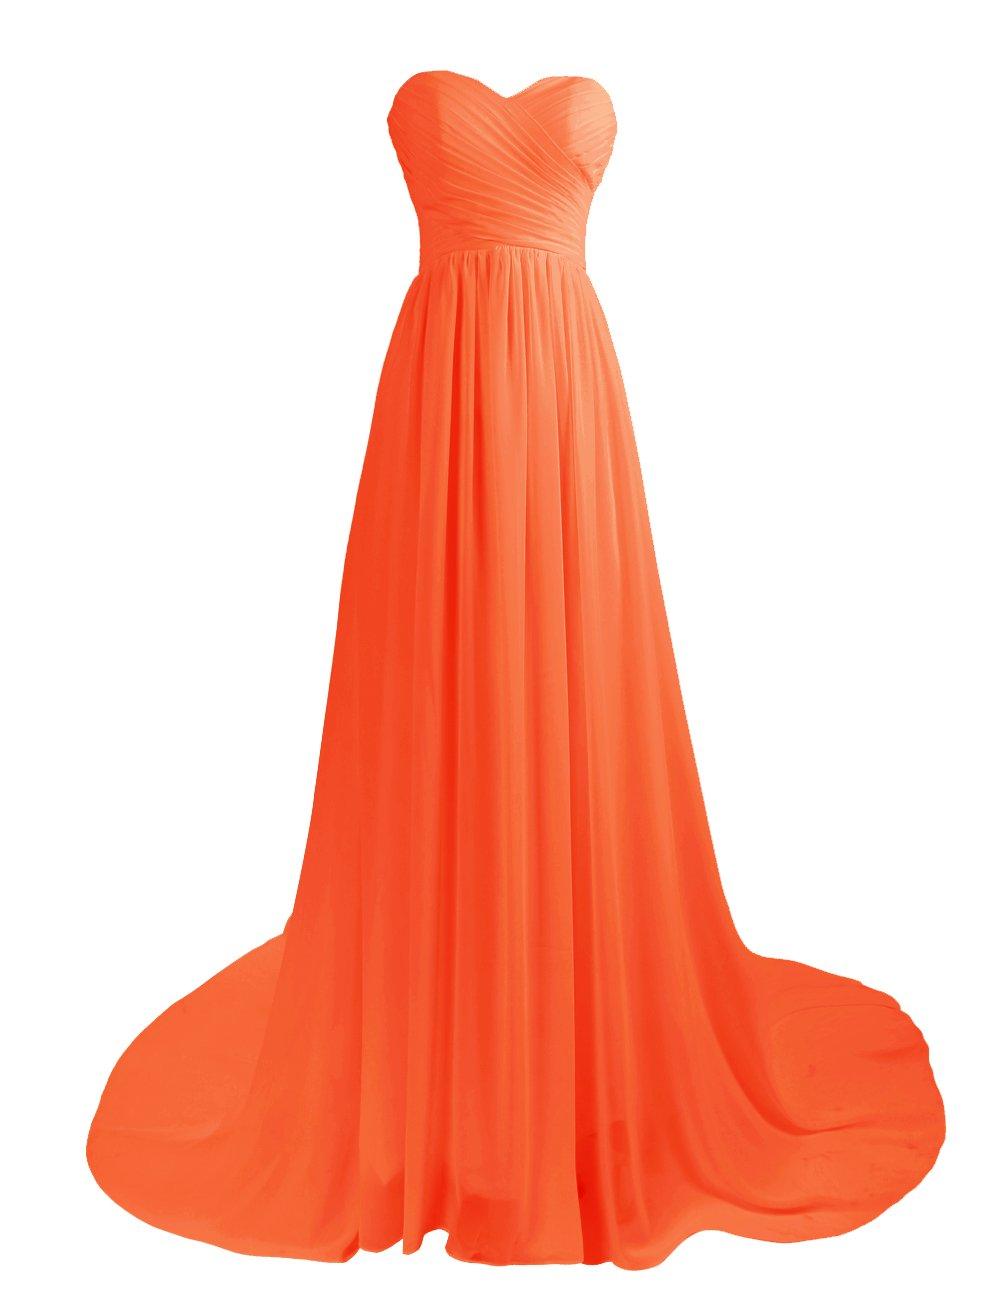 Dresstell 結婚式ドレス 花嫁ワンピース 二次会ドレス ロング丈 ベアトップ ビスチェタイプ レースアップ ブライズメイドドレス シンプルシフォン お呼ばれ フォーマルドレス 披露宴ドレス B00QI2TVNG JP5|オレンジ オレンジ JP5